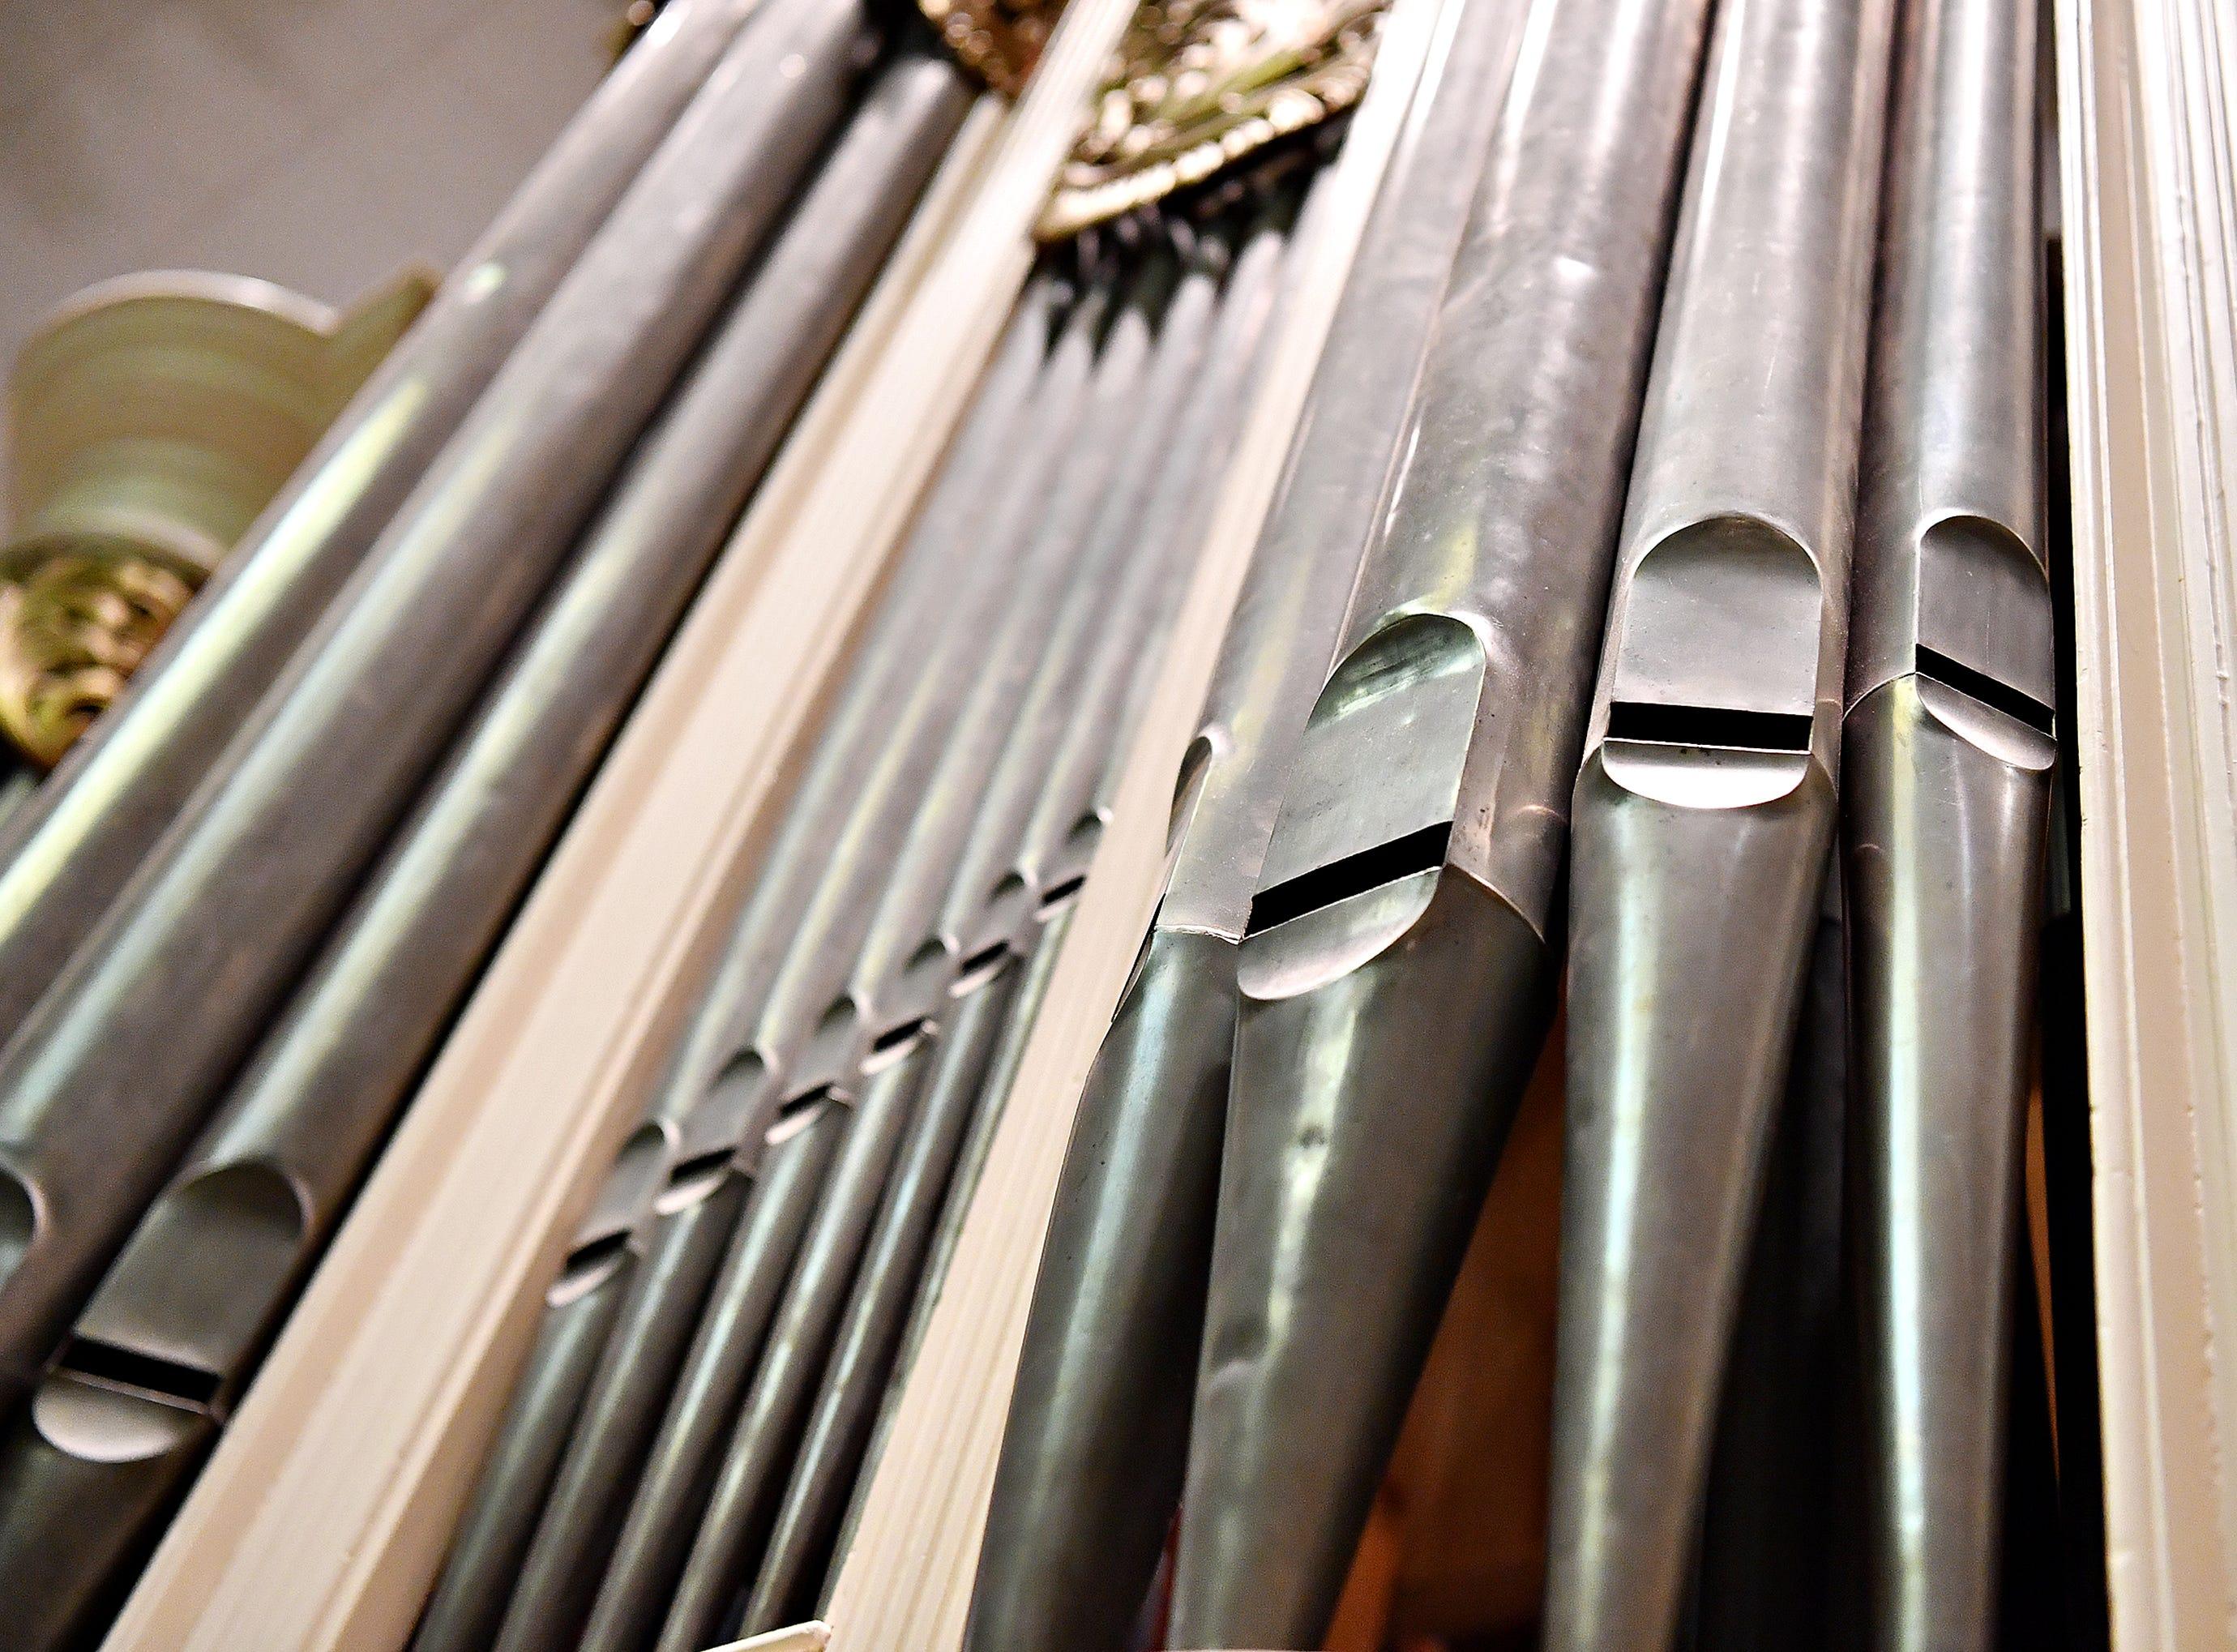 The 1804 David Tannenberg Organ at York County History Center in York City, Tuesday, Nov. 27, 2018. Dawn J. Sagert photo